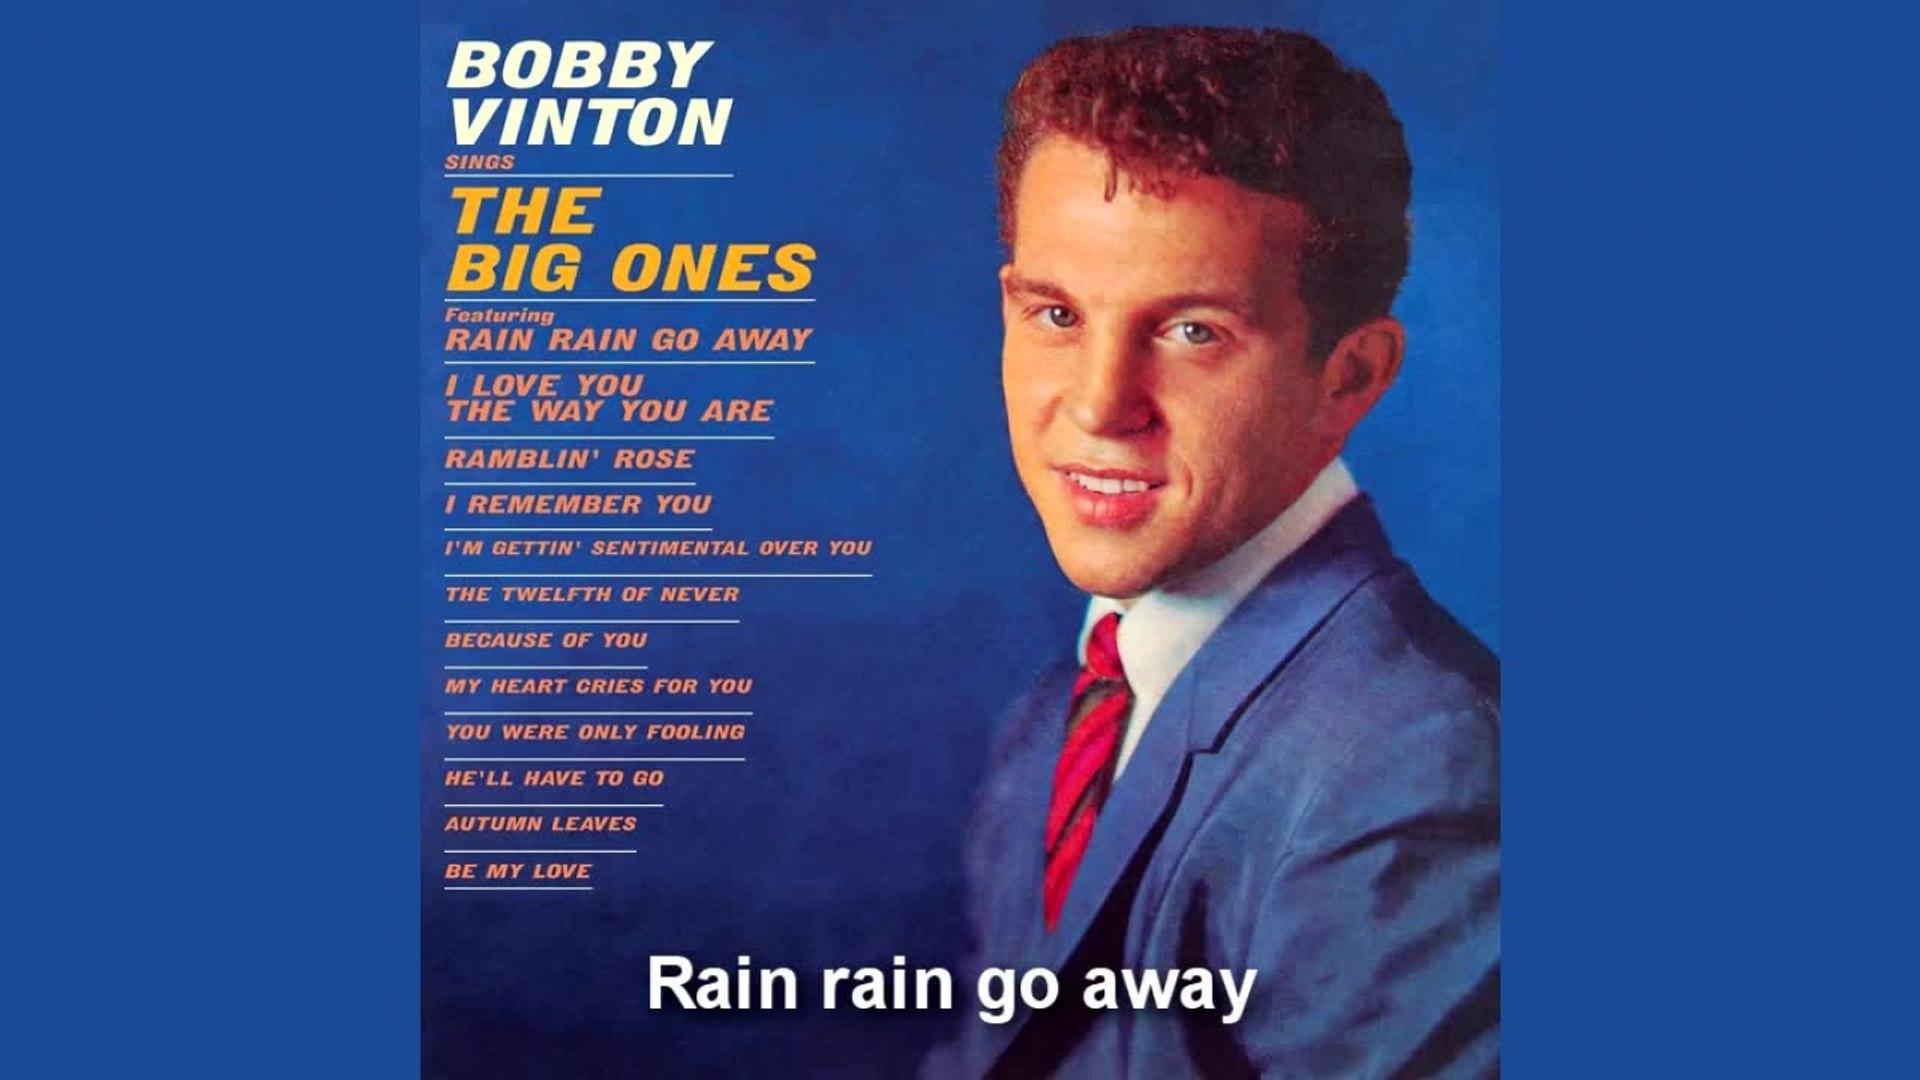 Bobby Vinton - Rain rain go away